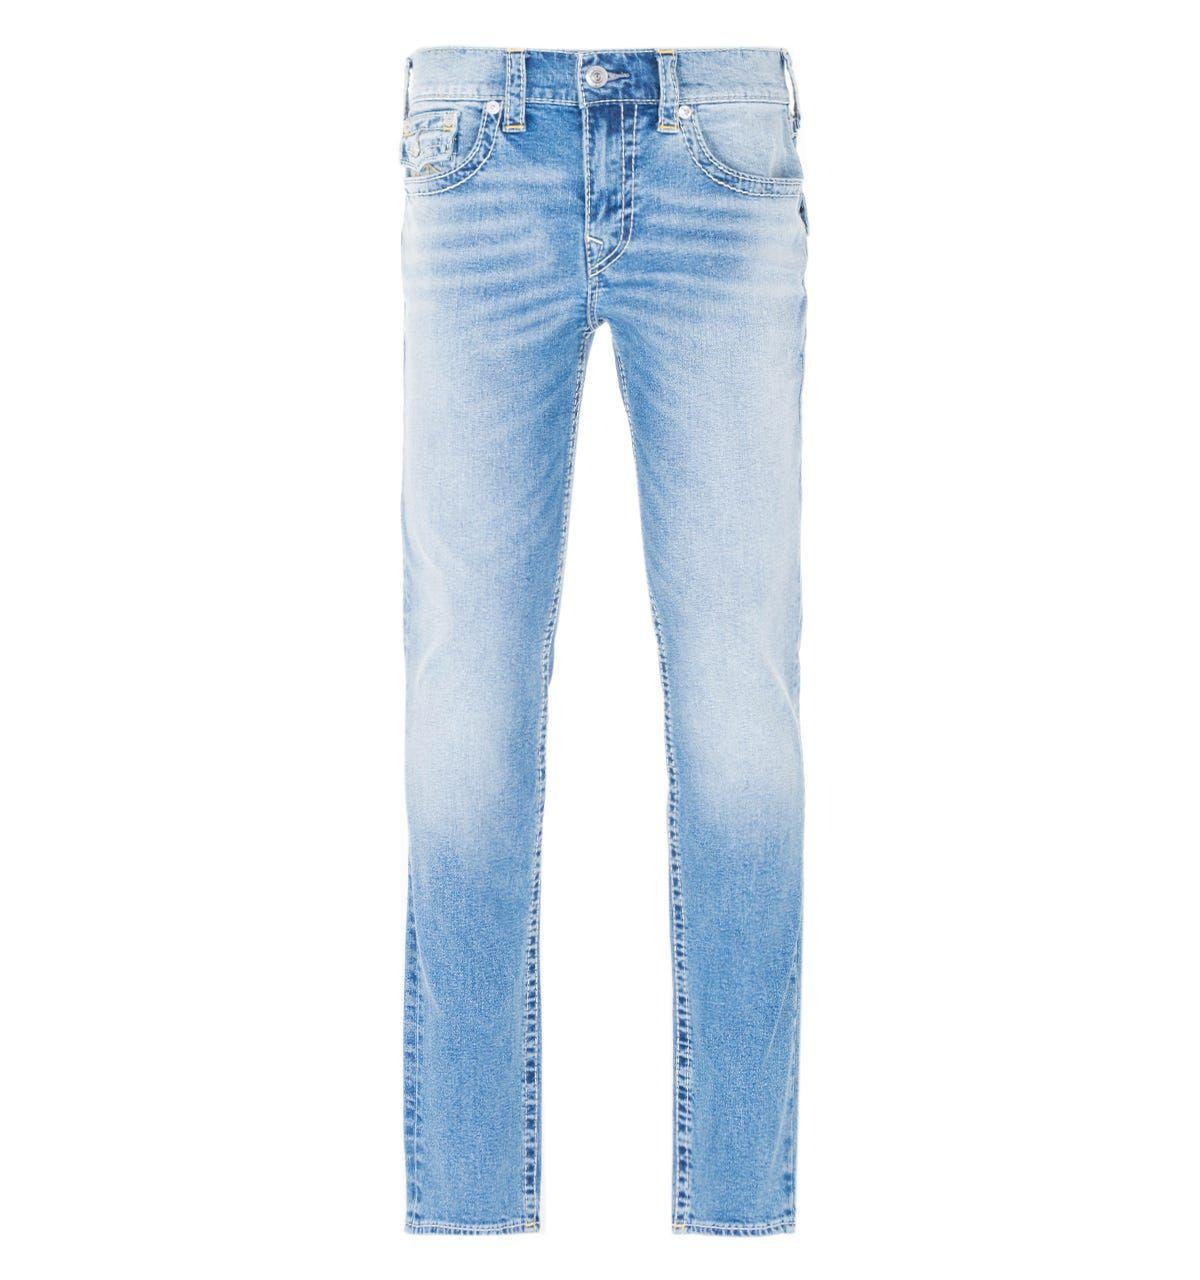 True Religion Rocco Big T Skinny Jeans - Light Blue